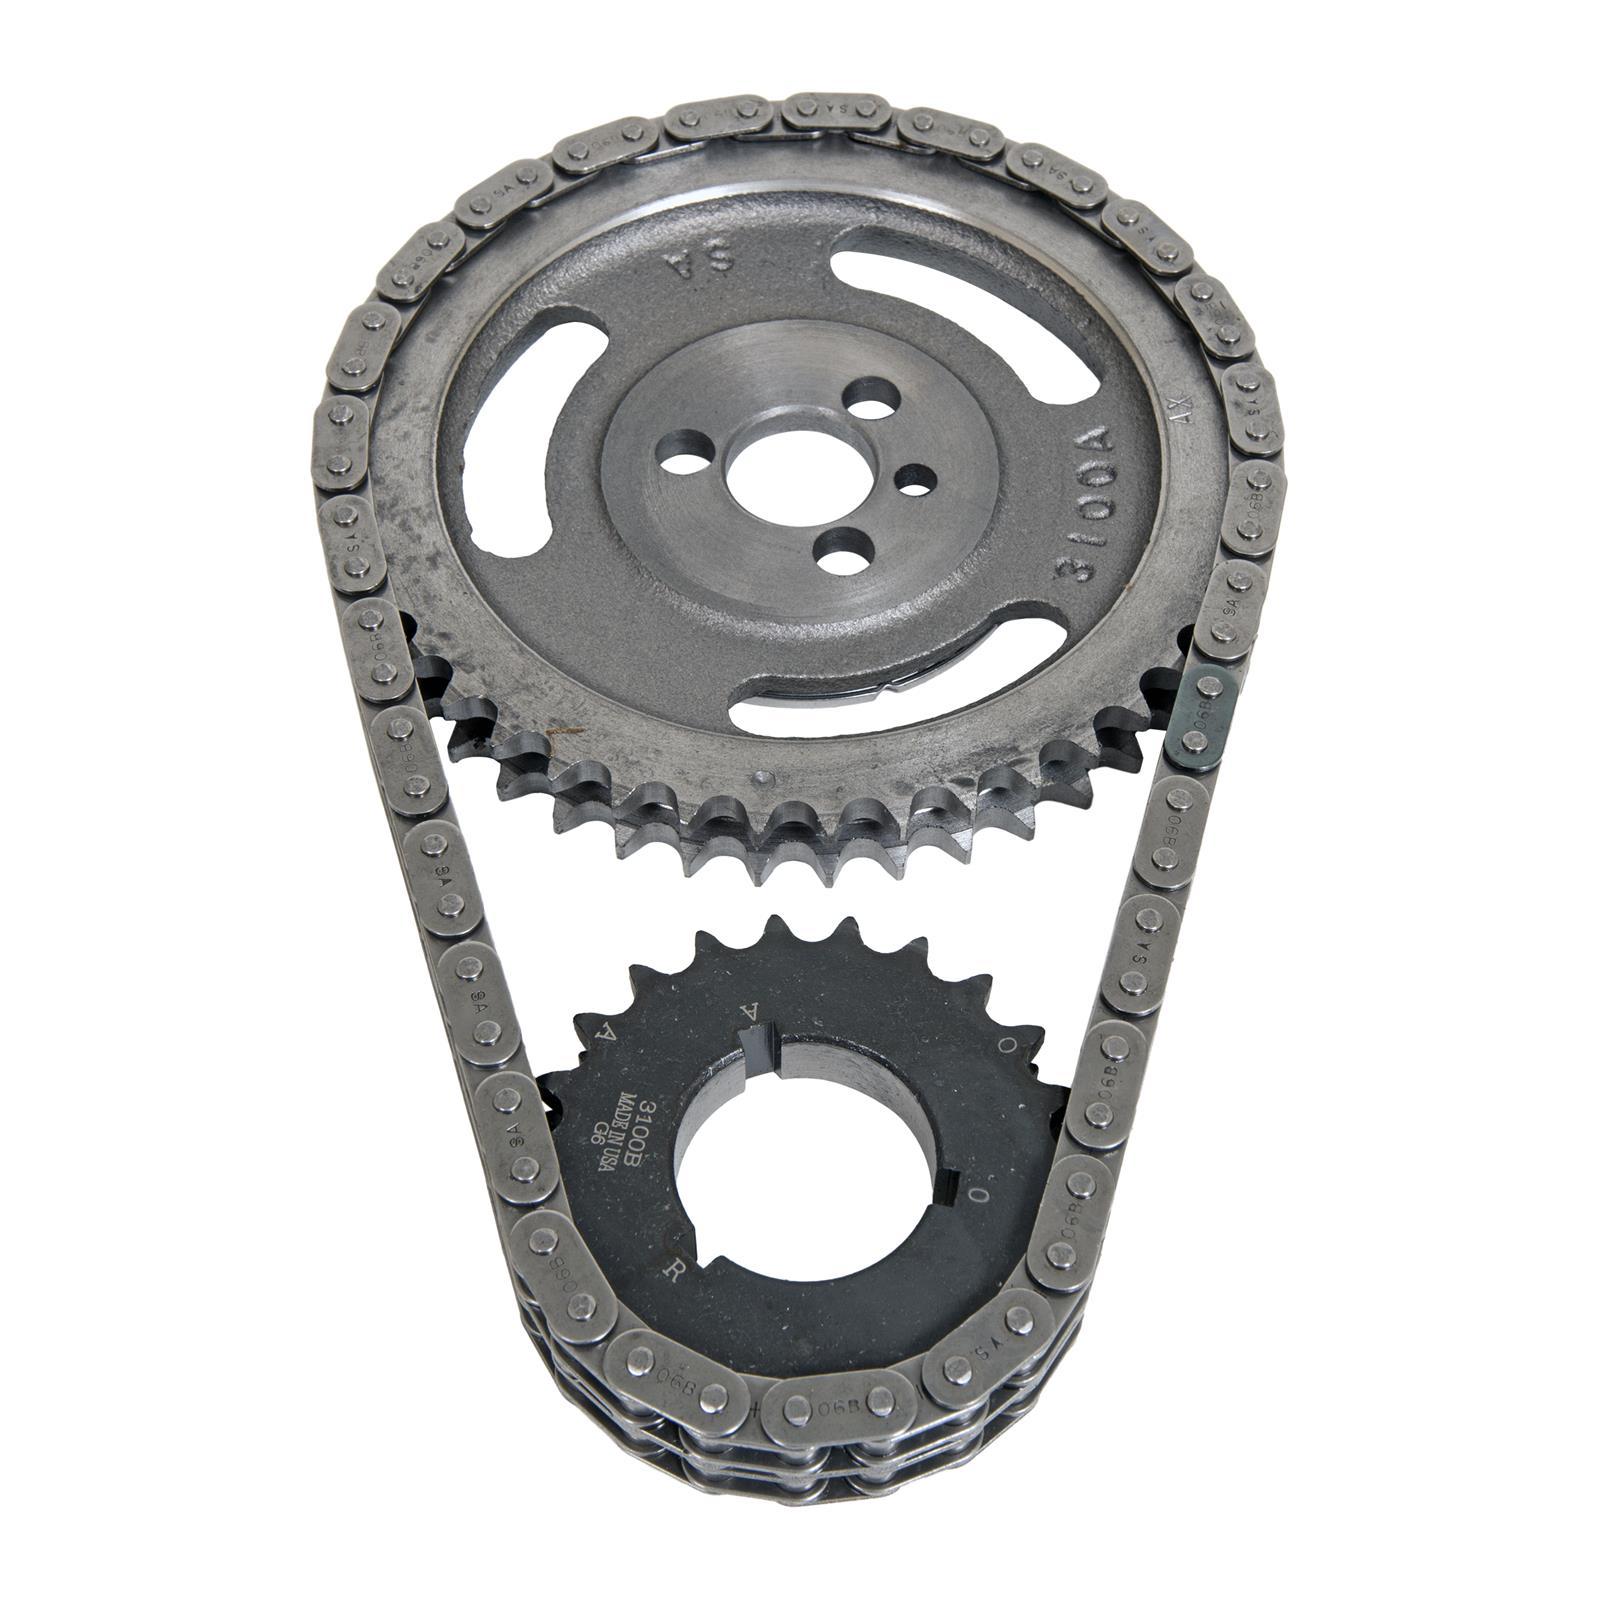 Lunati Full Roller Timing Sets With Torrington Bearing